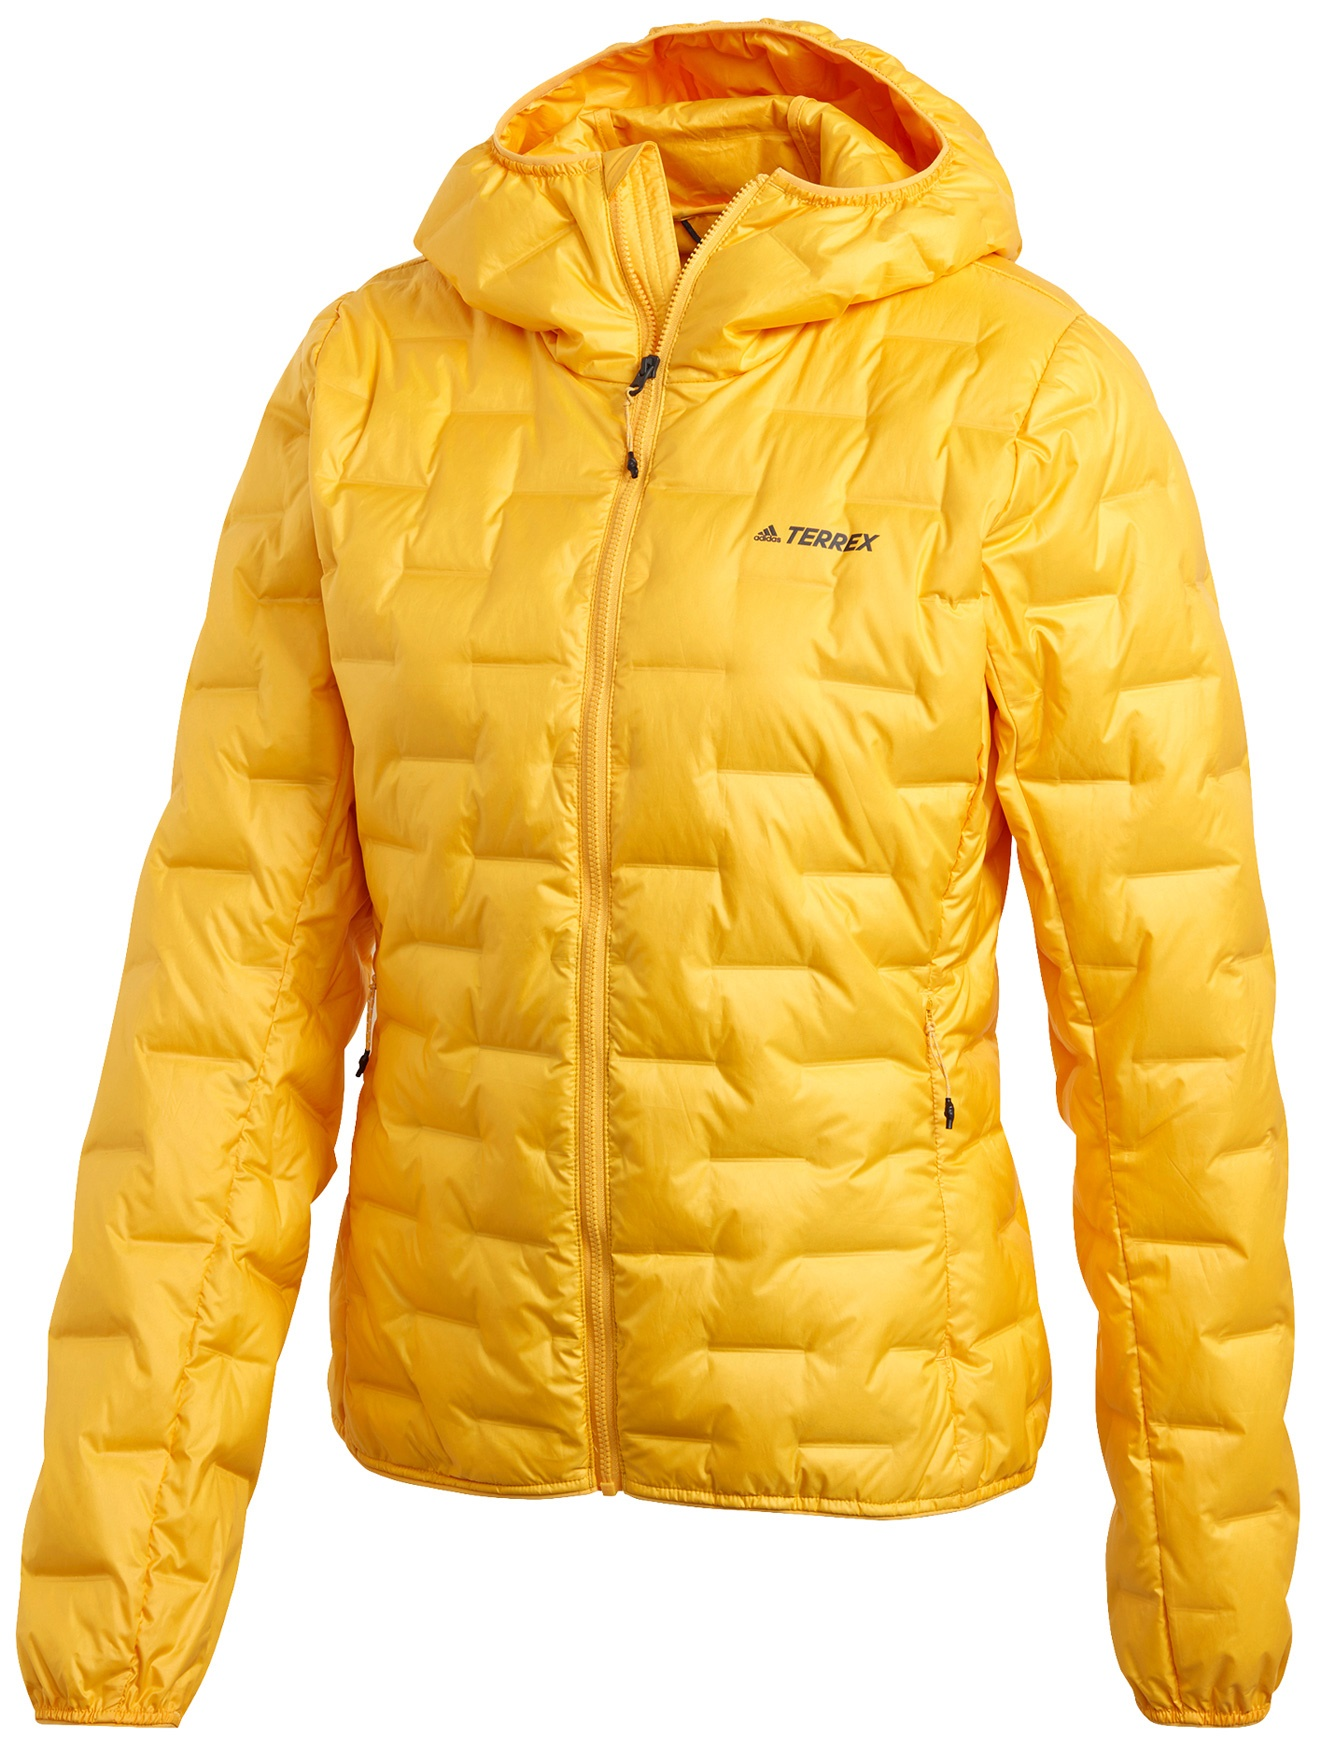 adidas Women's TERREX Light Hooded Down Jacket - active gold FT6960